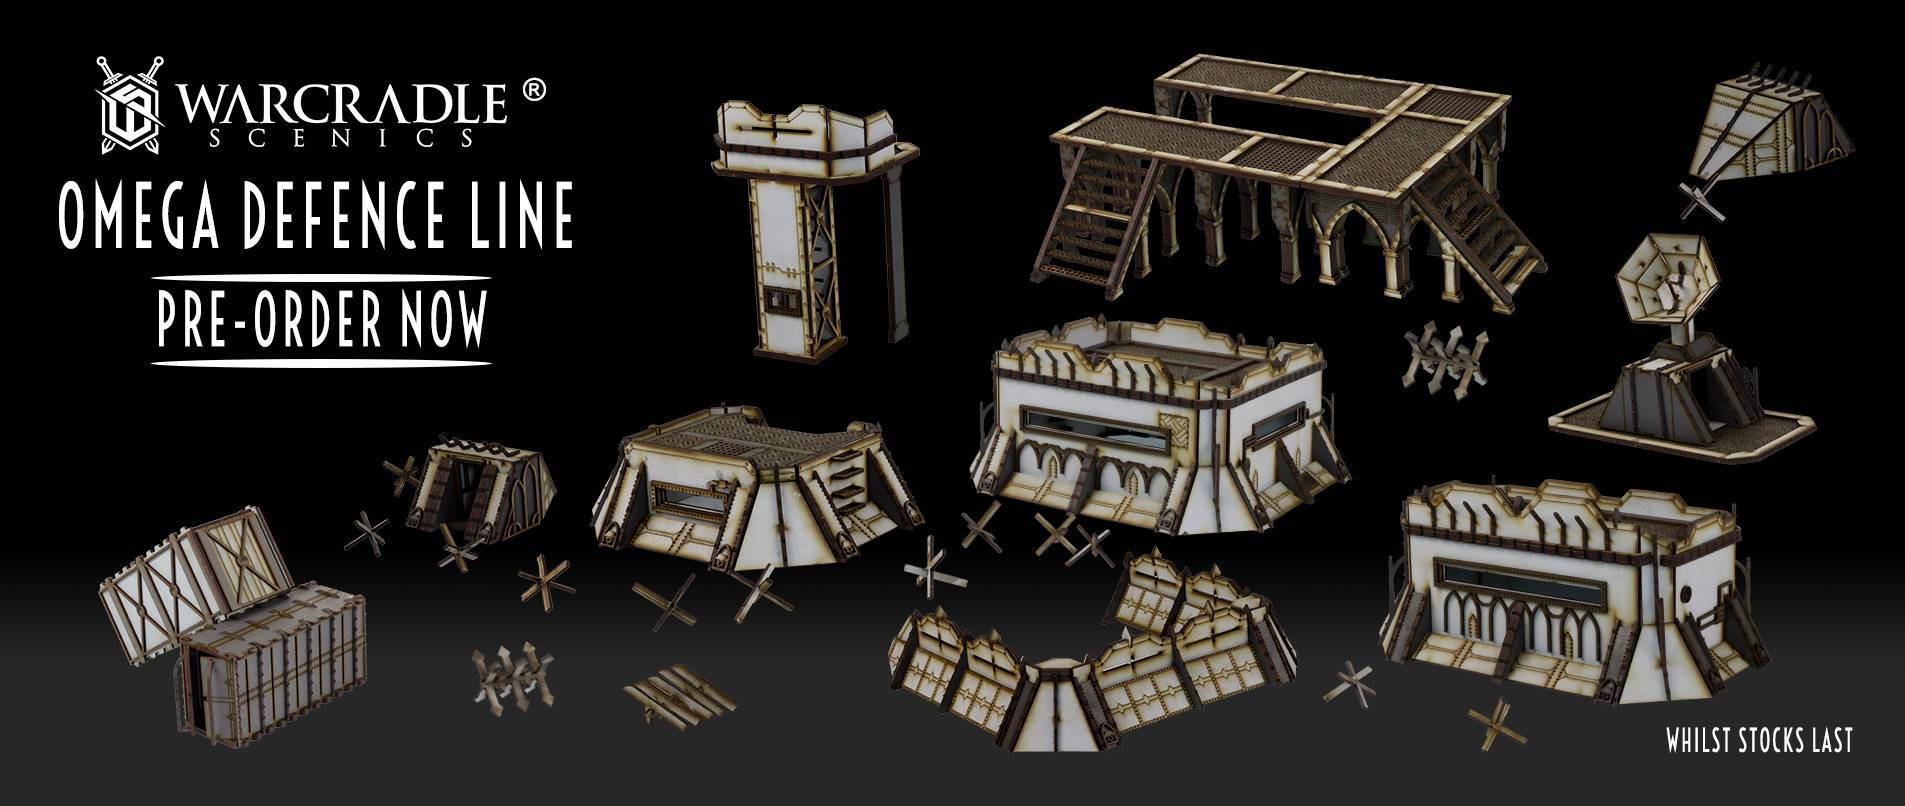 Omega Terrain Sets - Suppliers - Warcradle Distribution